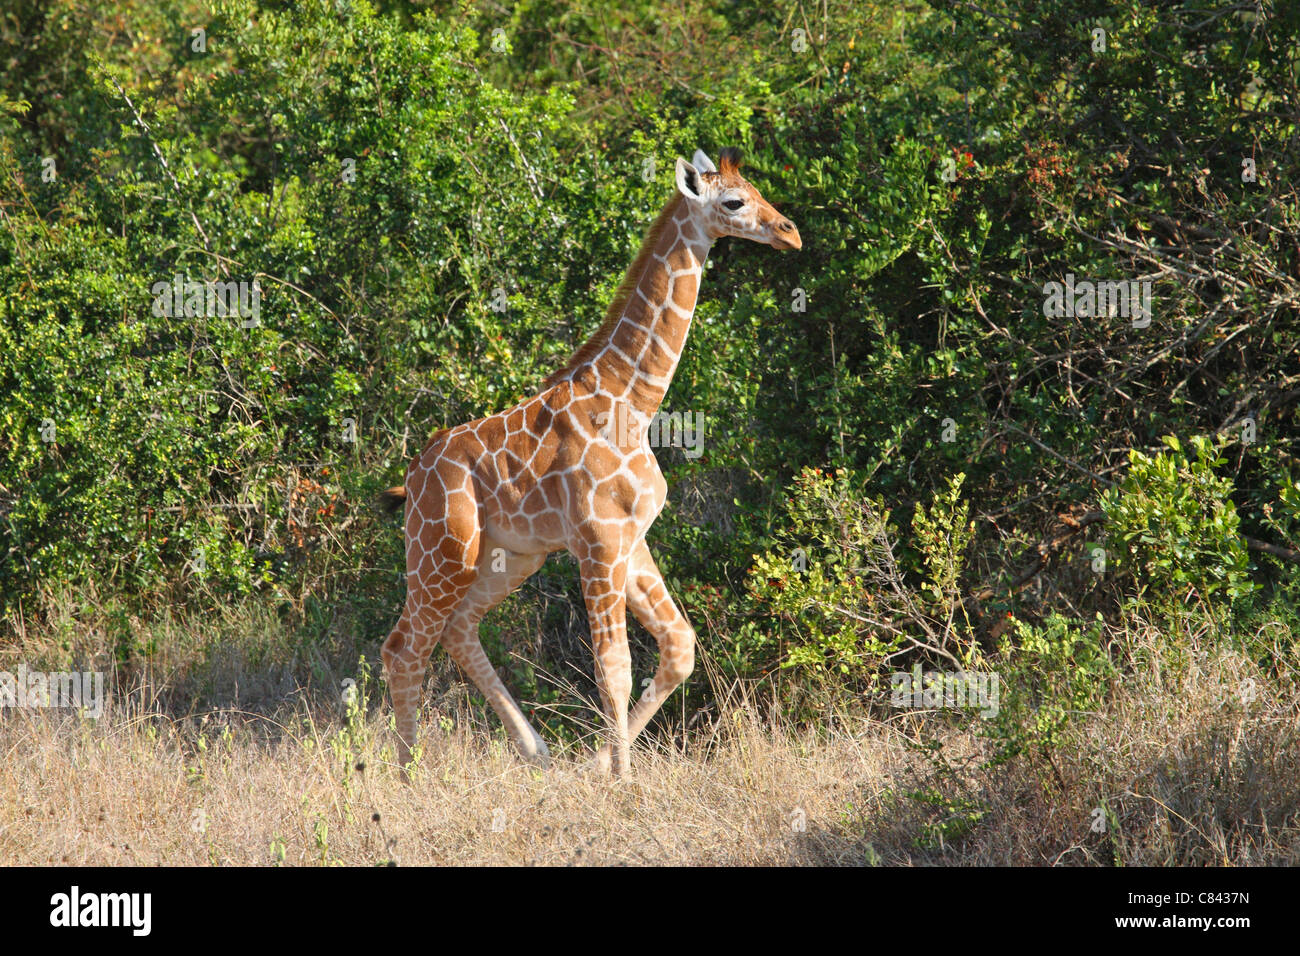 Reticulated Giraffe - cub / Giraffa camelopardalis reticulata Stock Photo